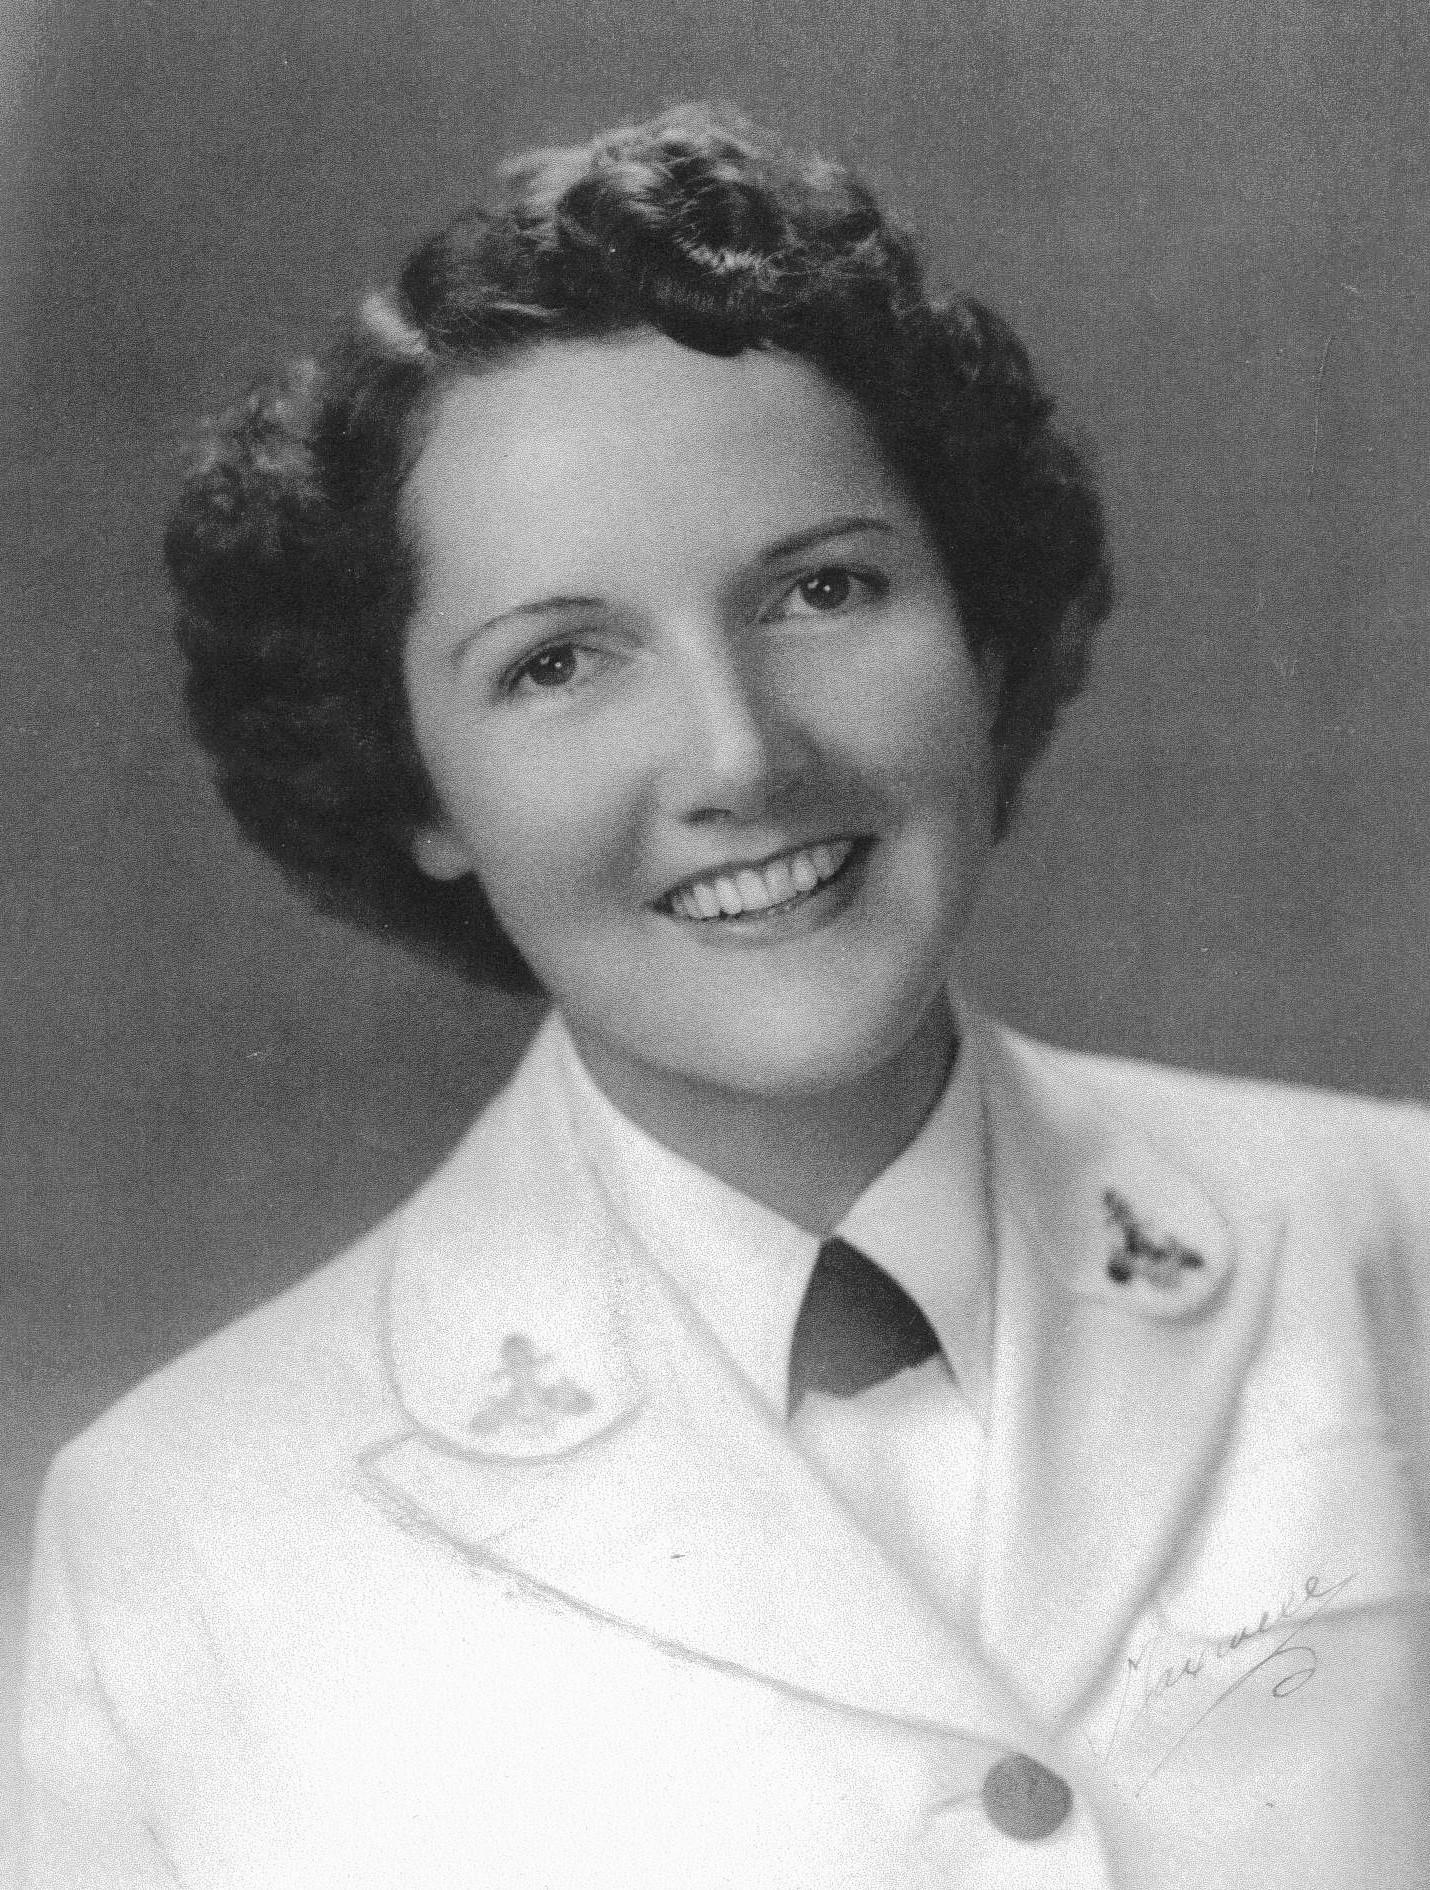 Elaine F. Wood